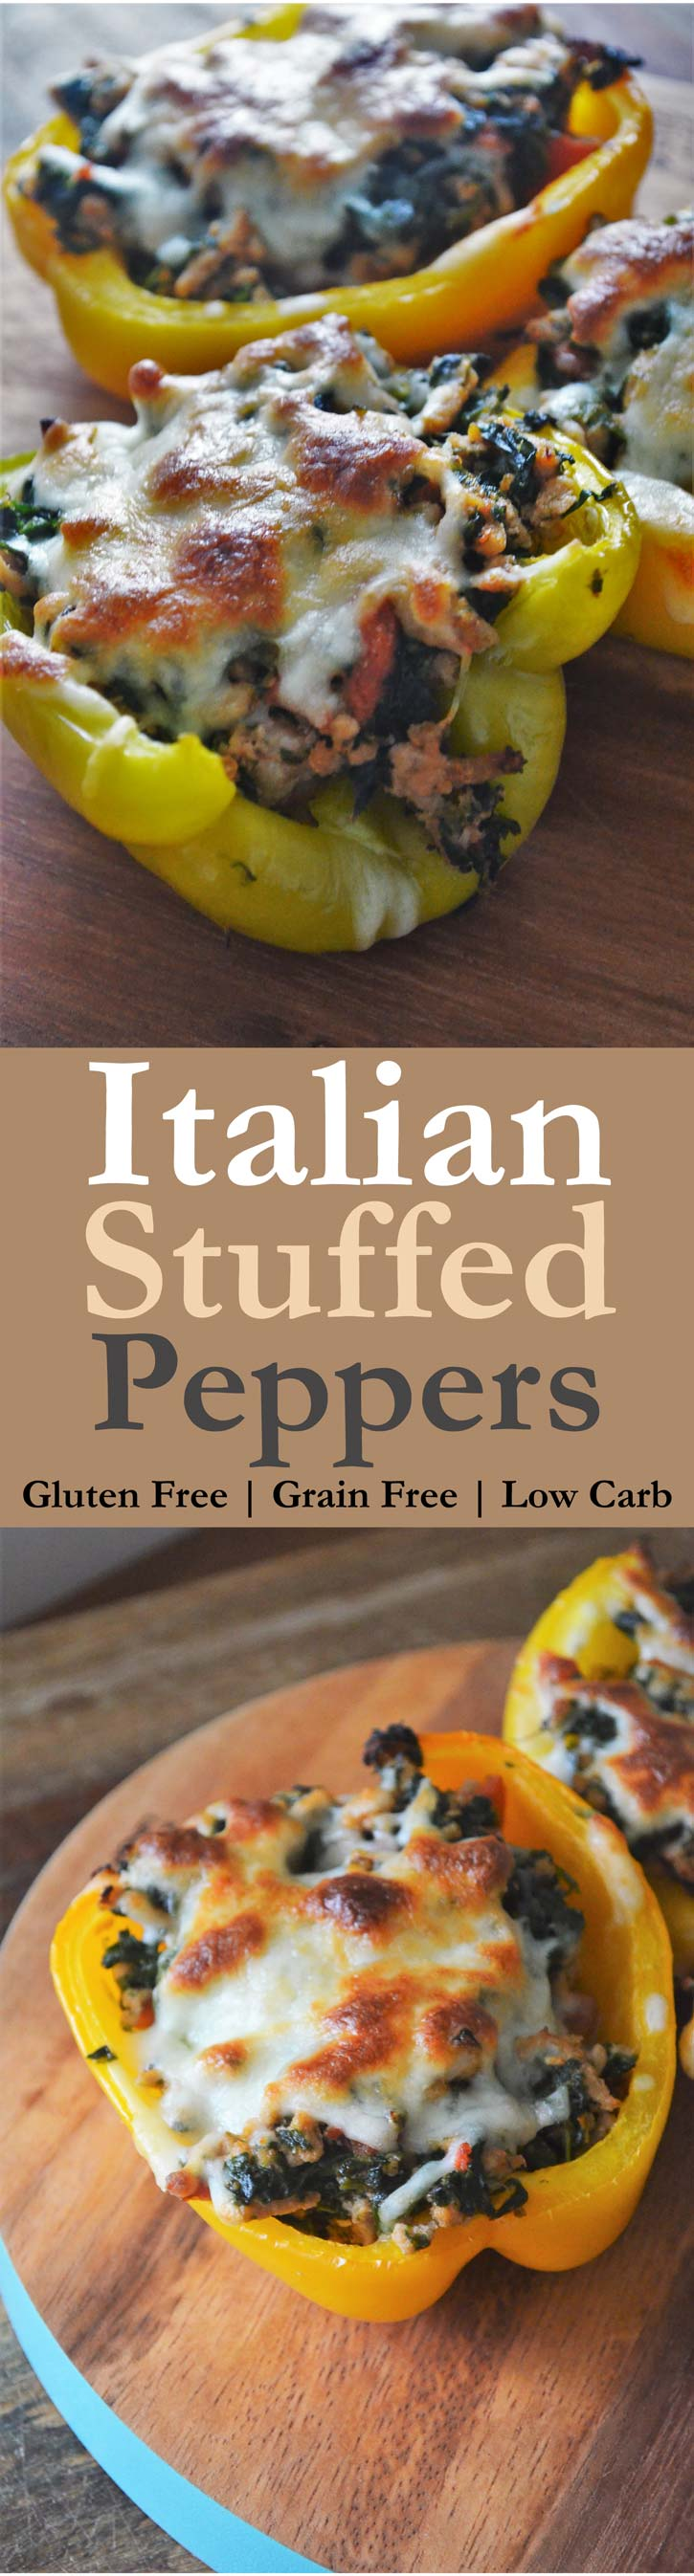 italian stuffed peppers homemade gluten free grain free low carb ground turkey